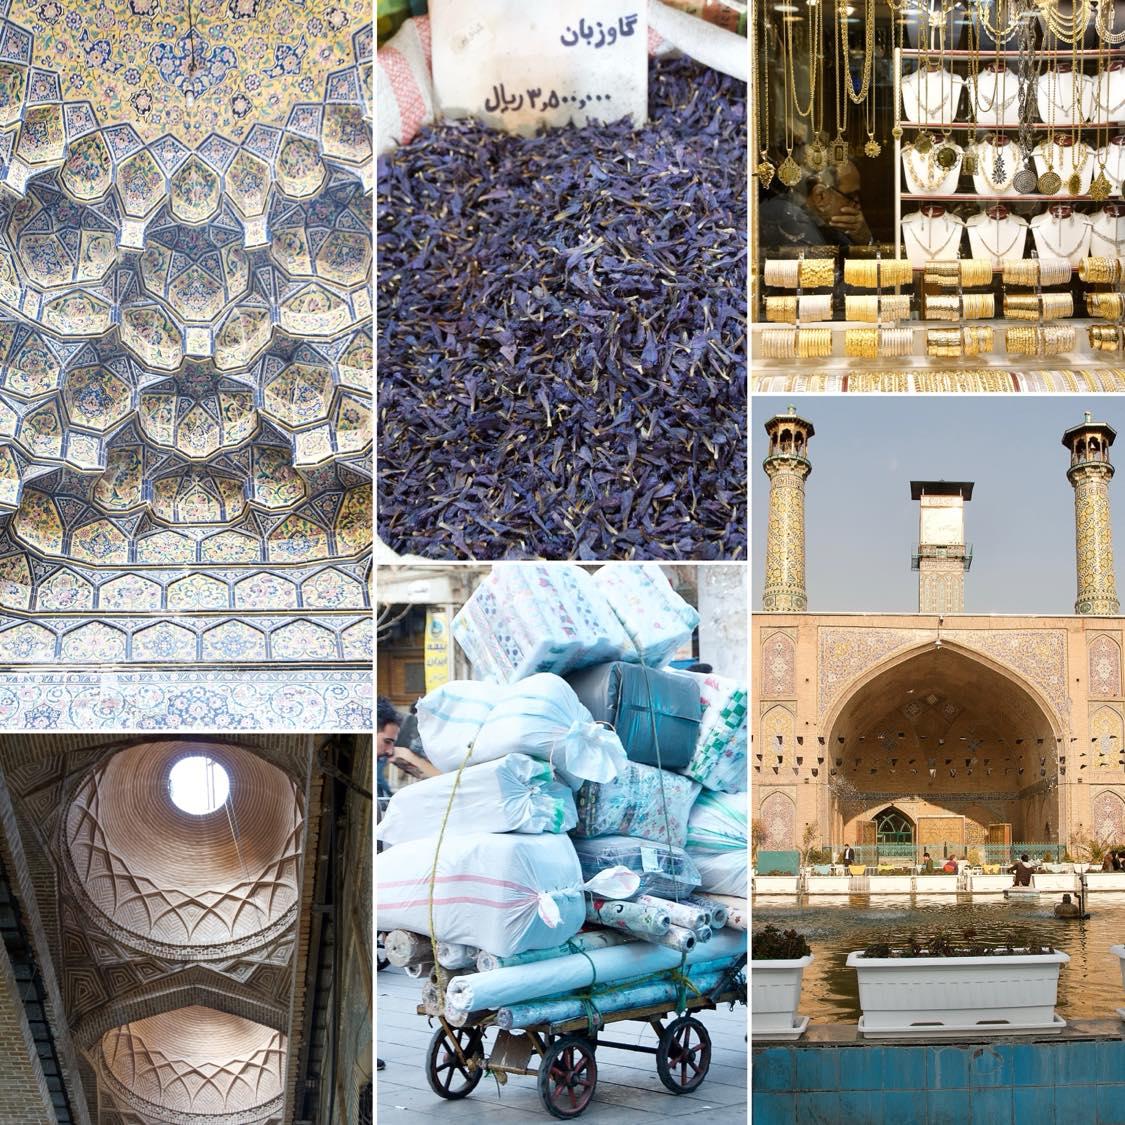 GRAND BAZAR TEHRAN – BAZAR-E BOZORG-E TEHRAN, Tehran, Reisebericht, Collage Tehran, Teheran